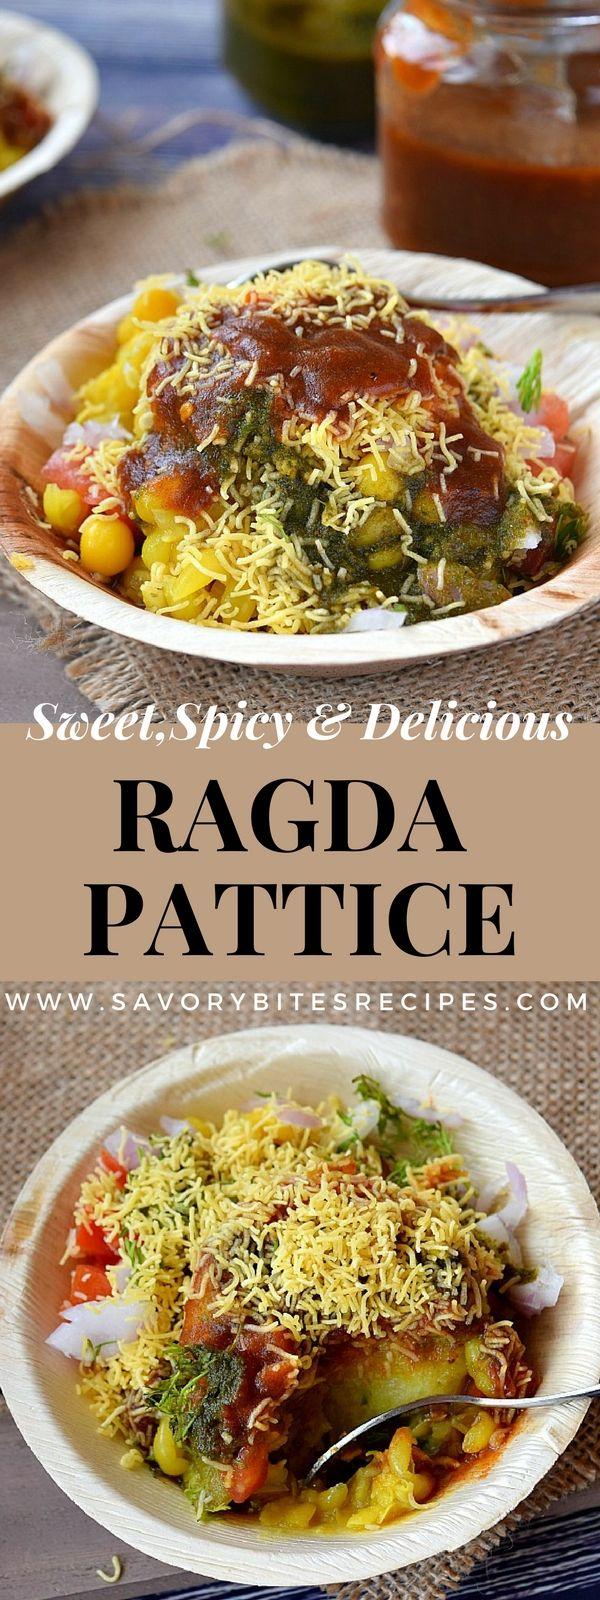 16 best street food images on pinterest indian snacks indian indian street food at its best ragda pattice ragdapattice vegetarian recipe forumfinder Images